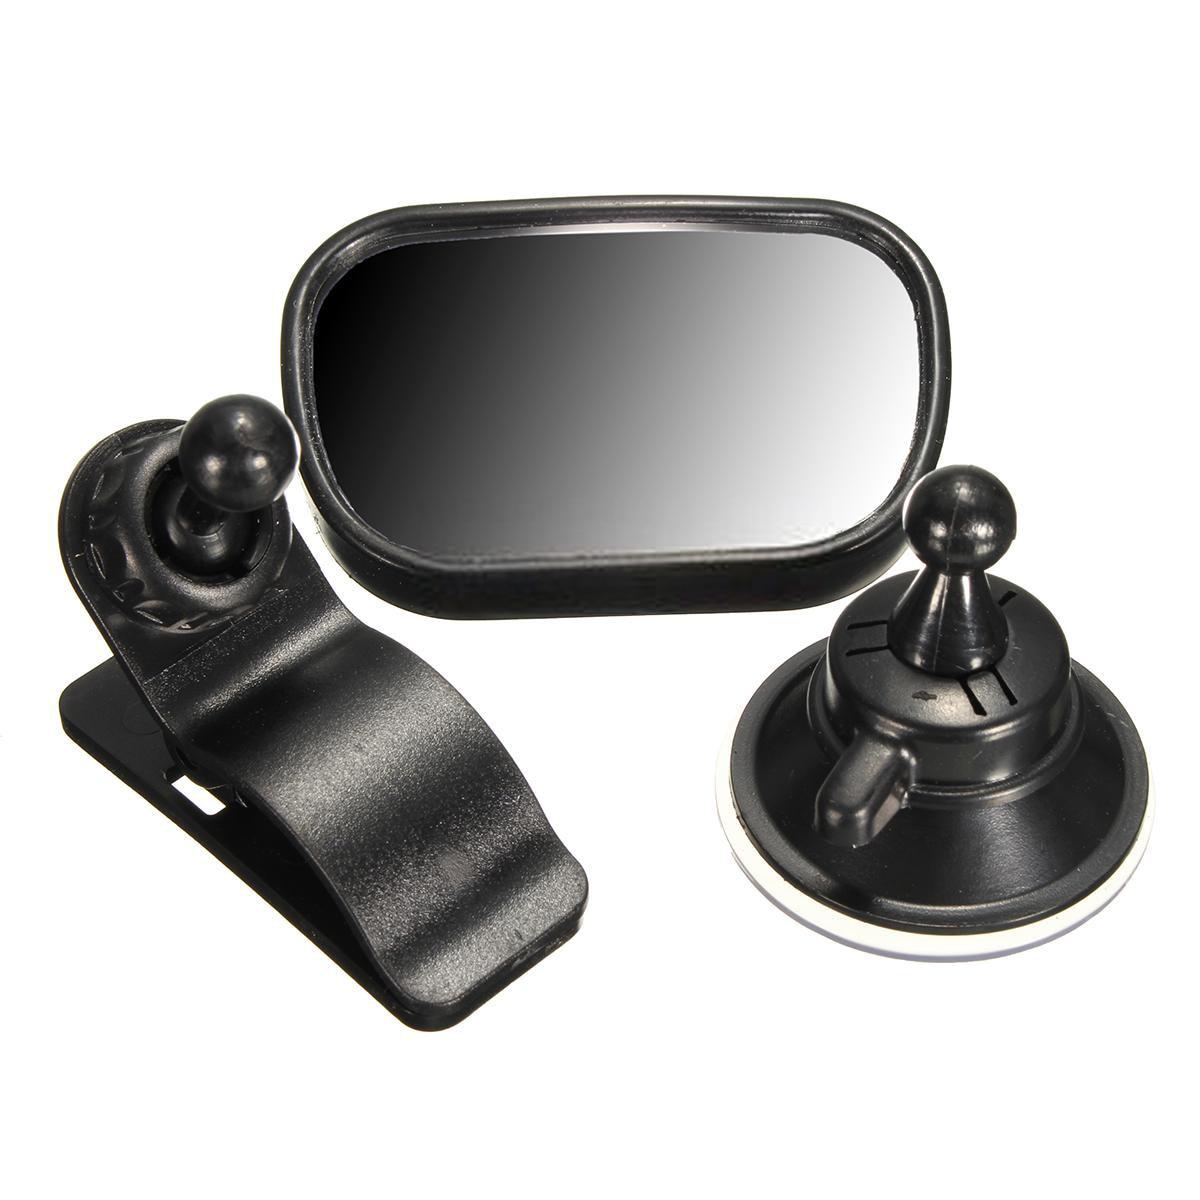 car safety seat rear-view mirror for children